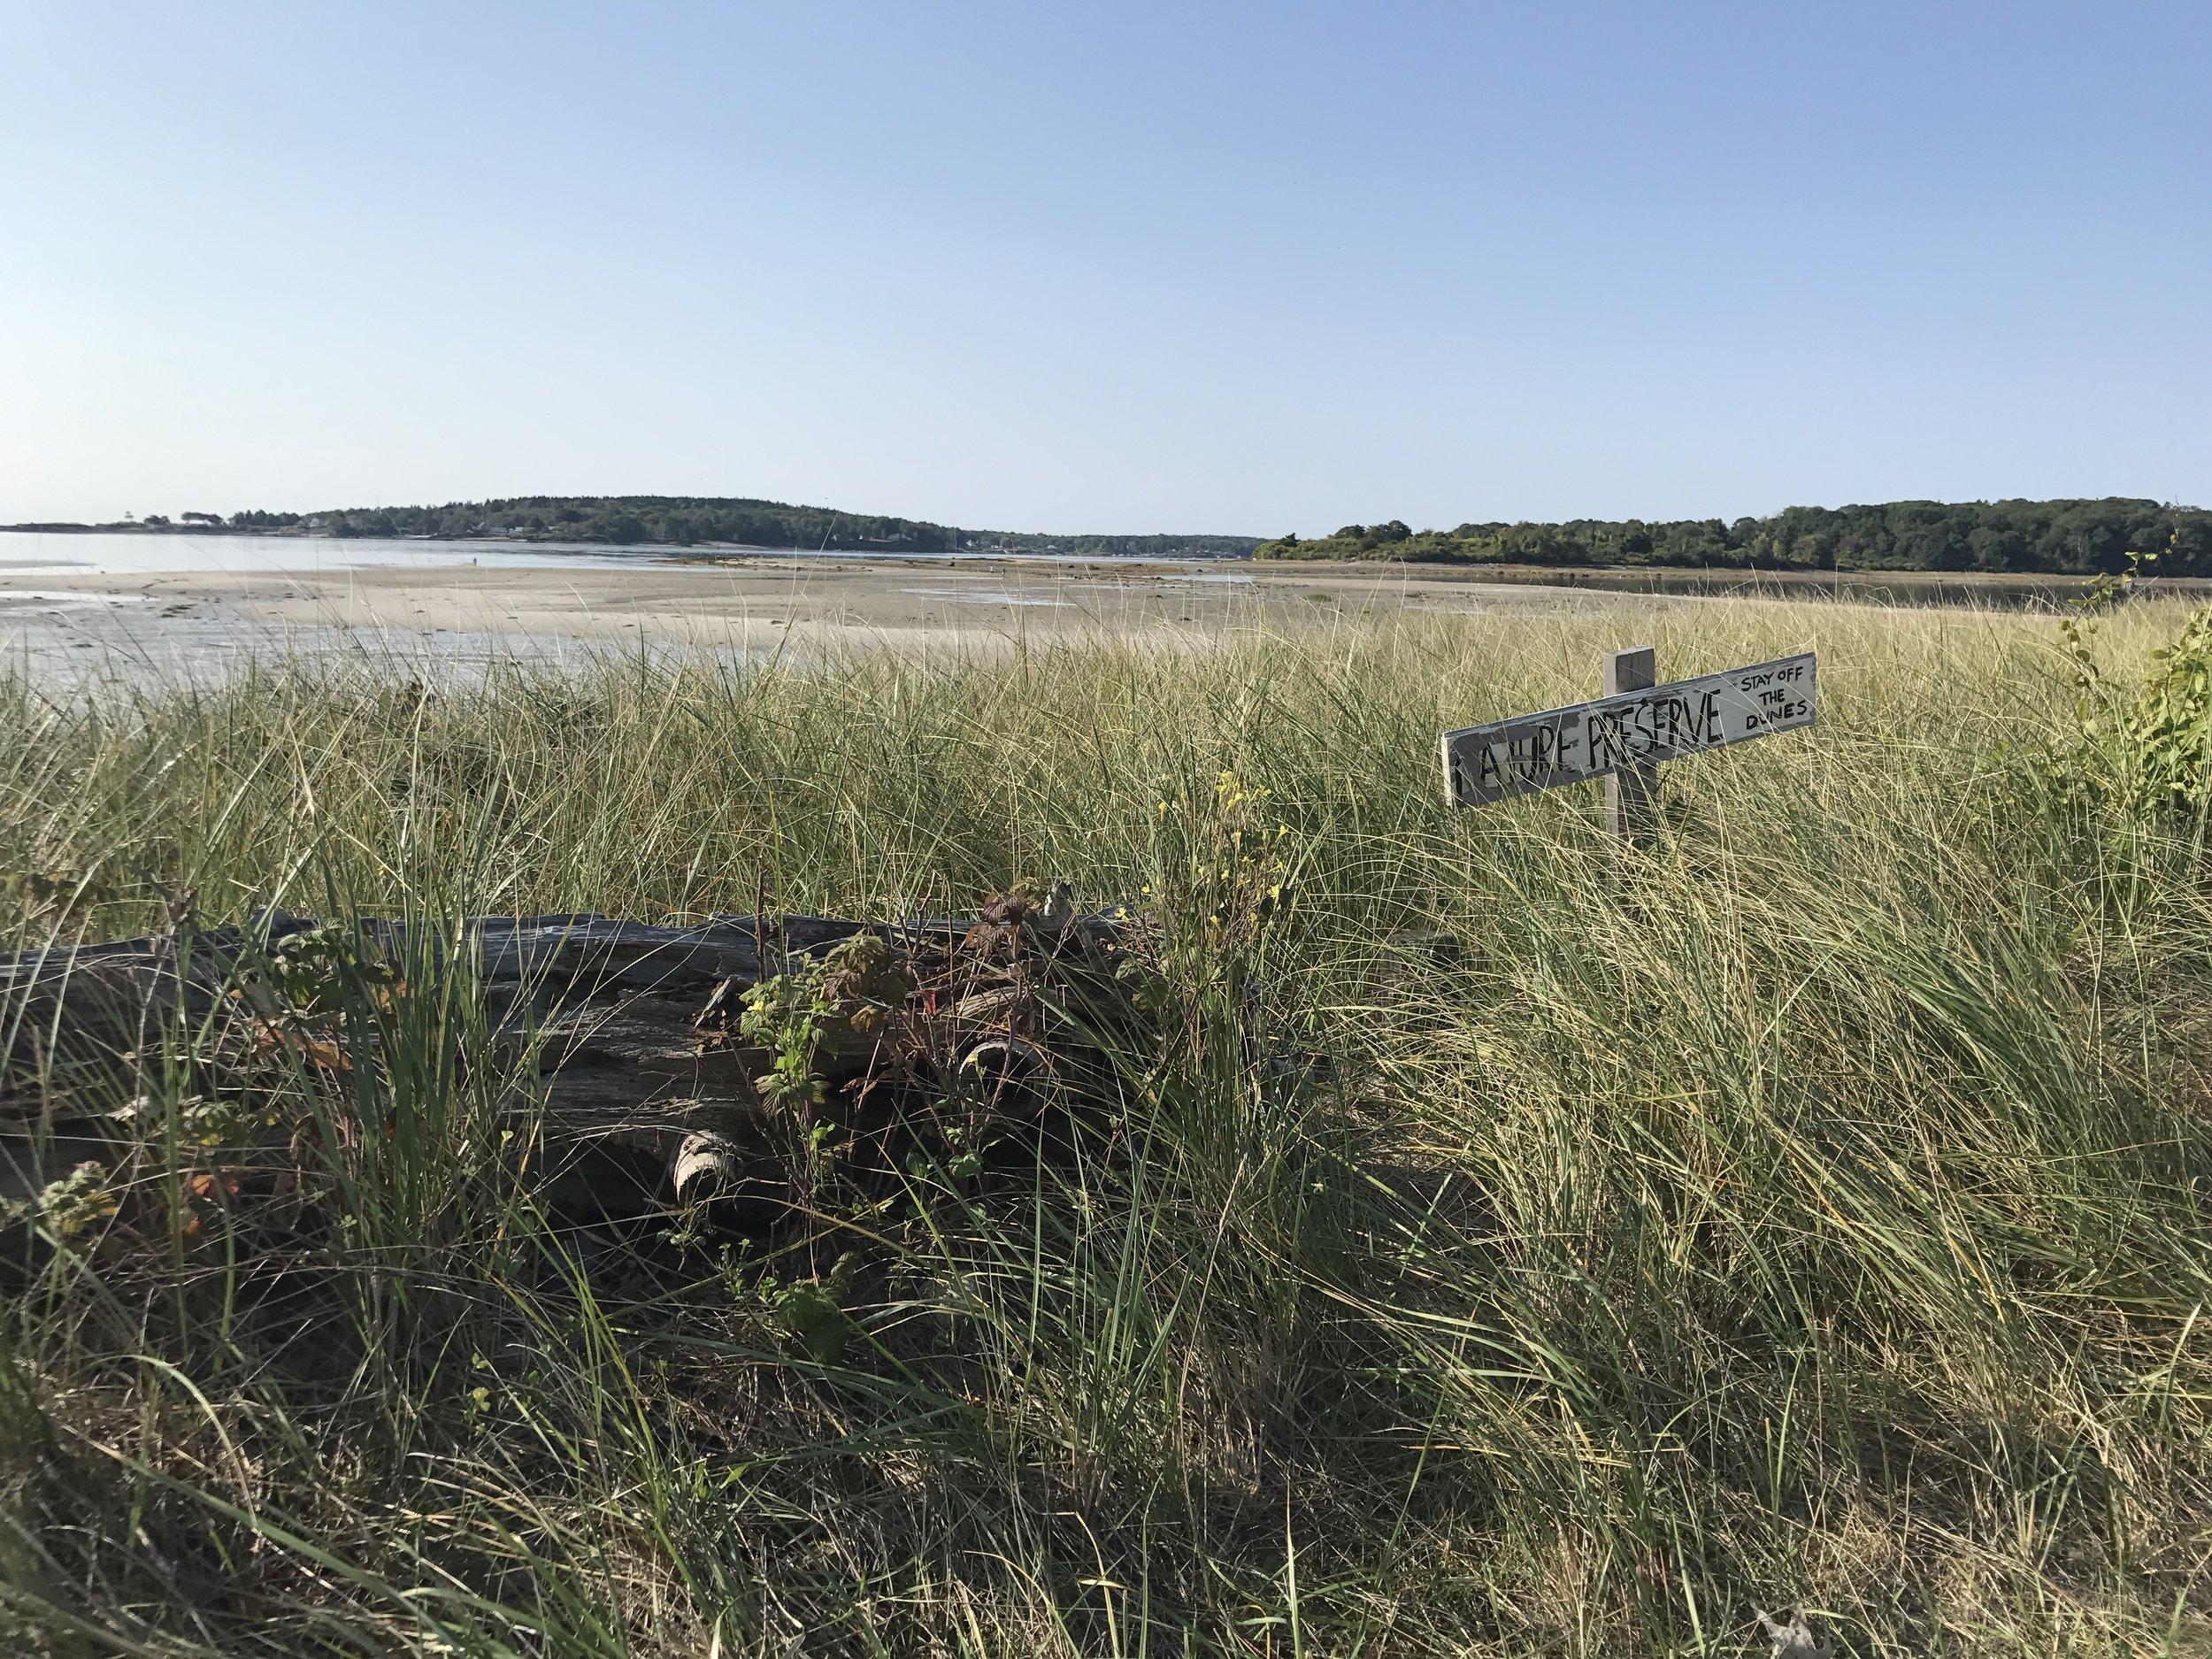 trails through dune grass on beach